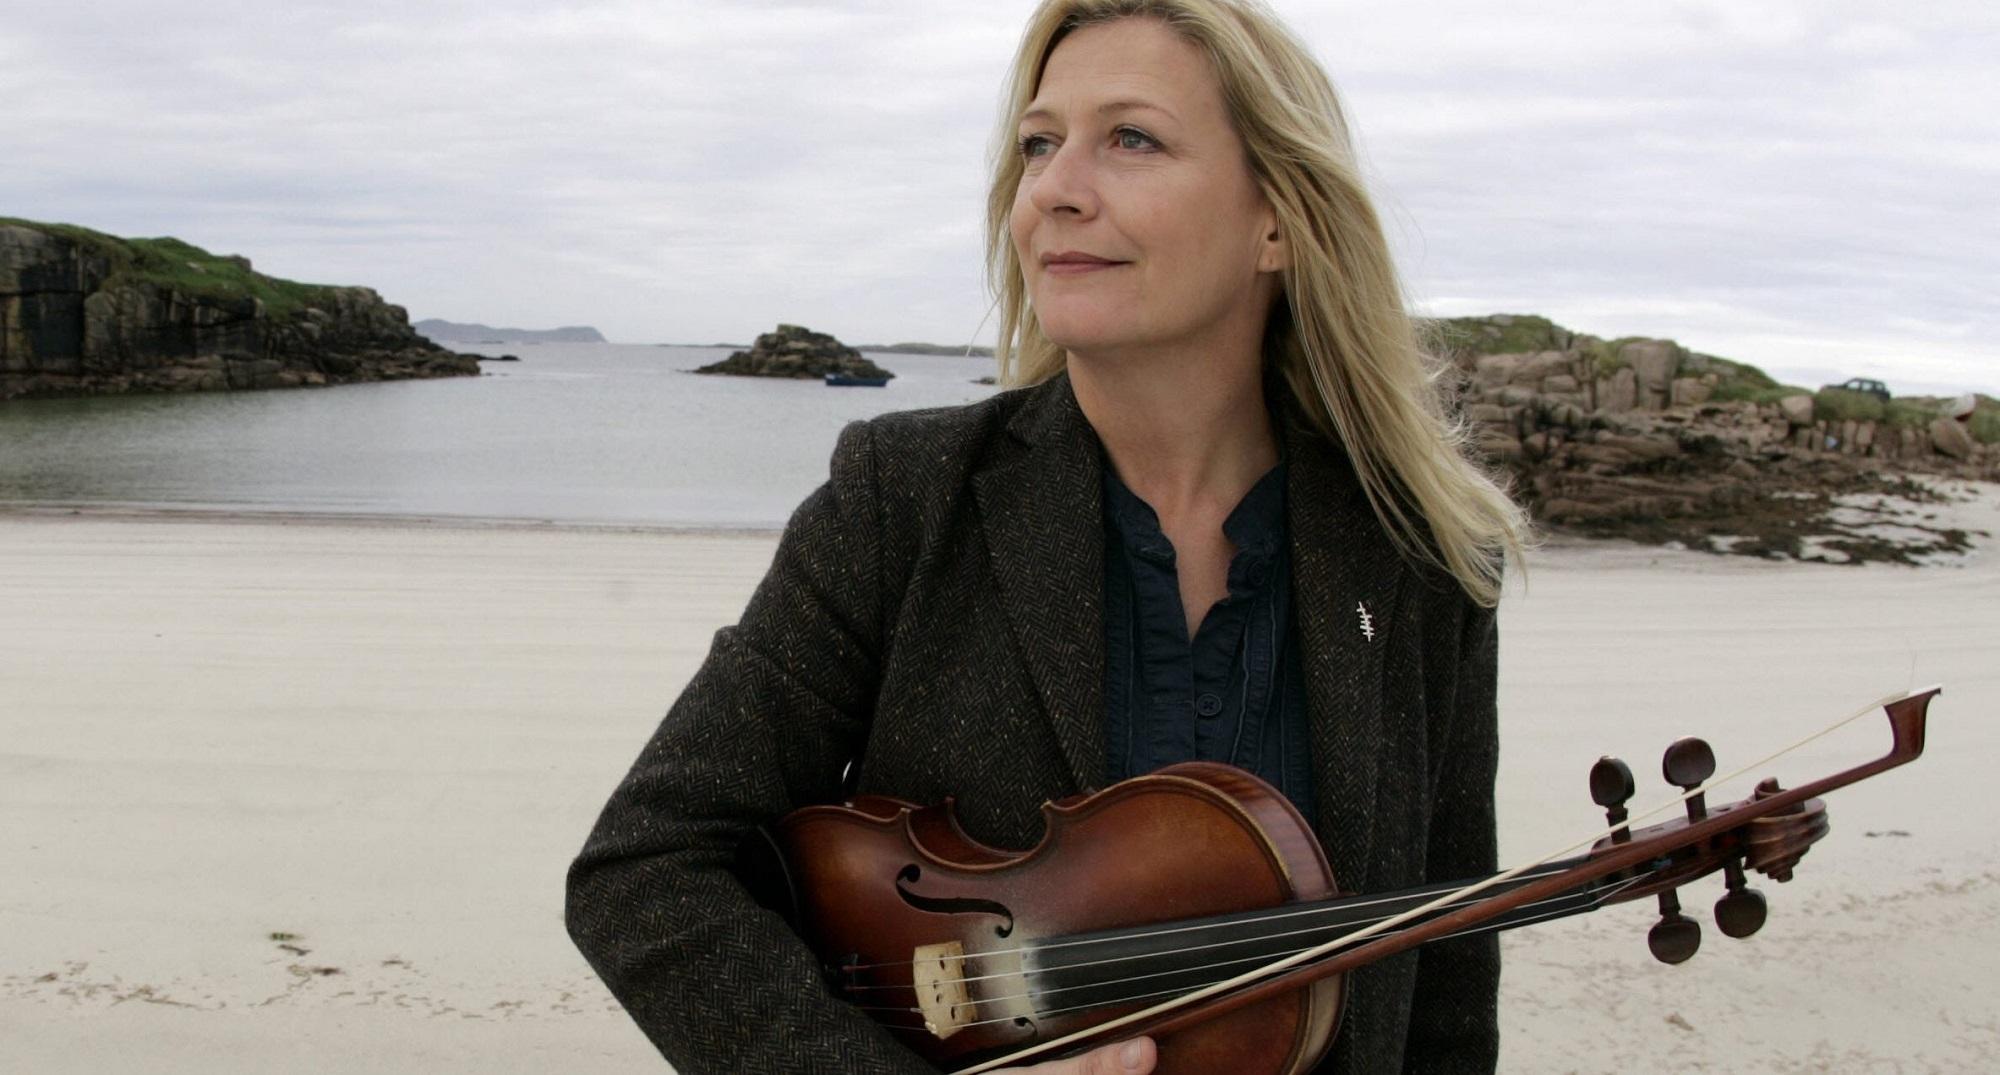 A Minute In Donegal With Altan's Mairéad Ní Mhaonaigh